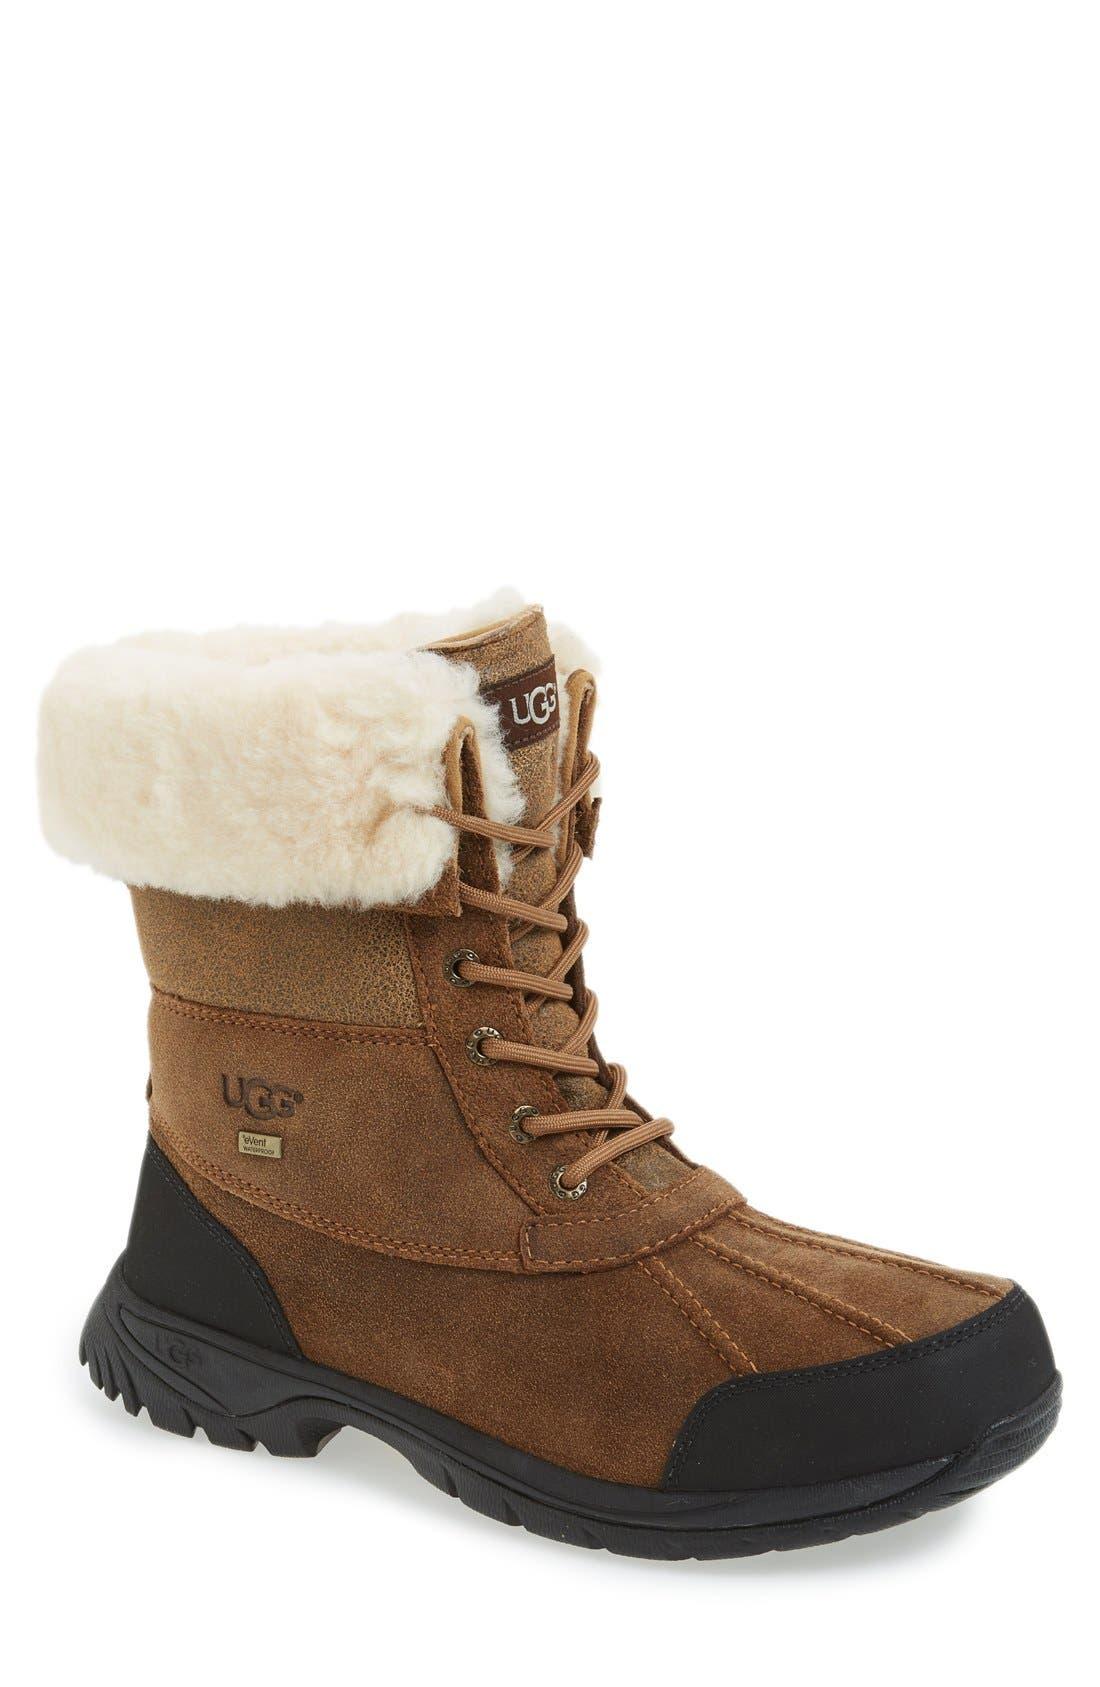 Main Image - UGG® Butte Bomber Snow Boot (Men)